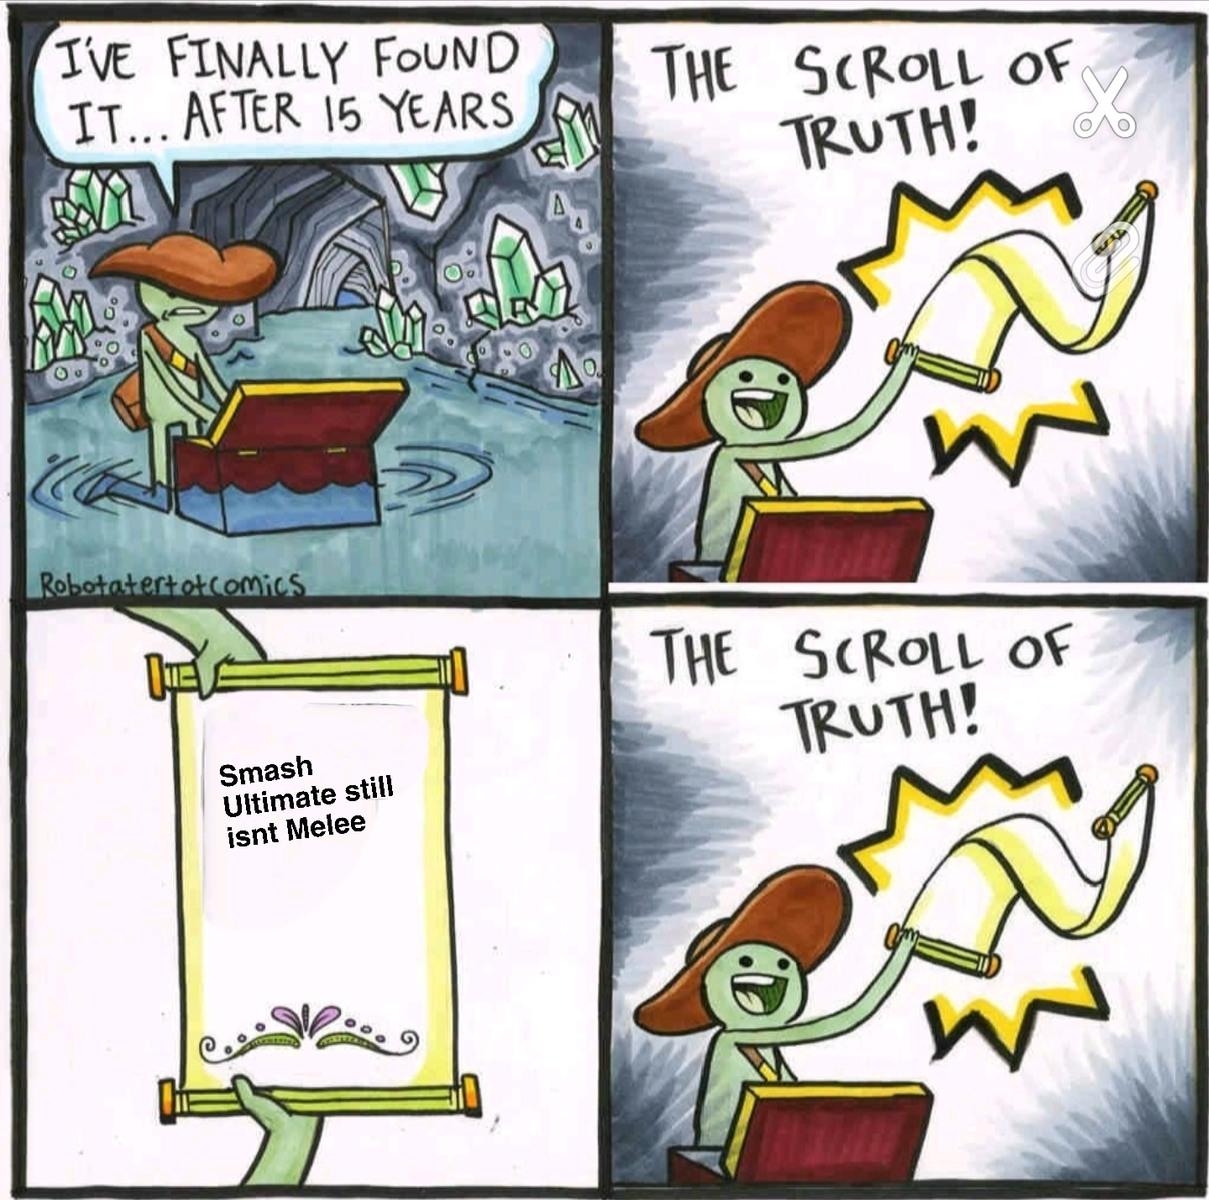 2001 Smash Odyssey - meme